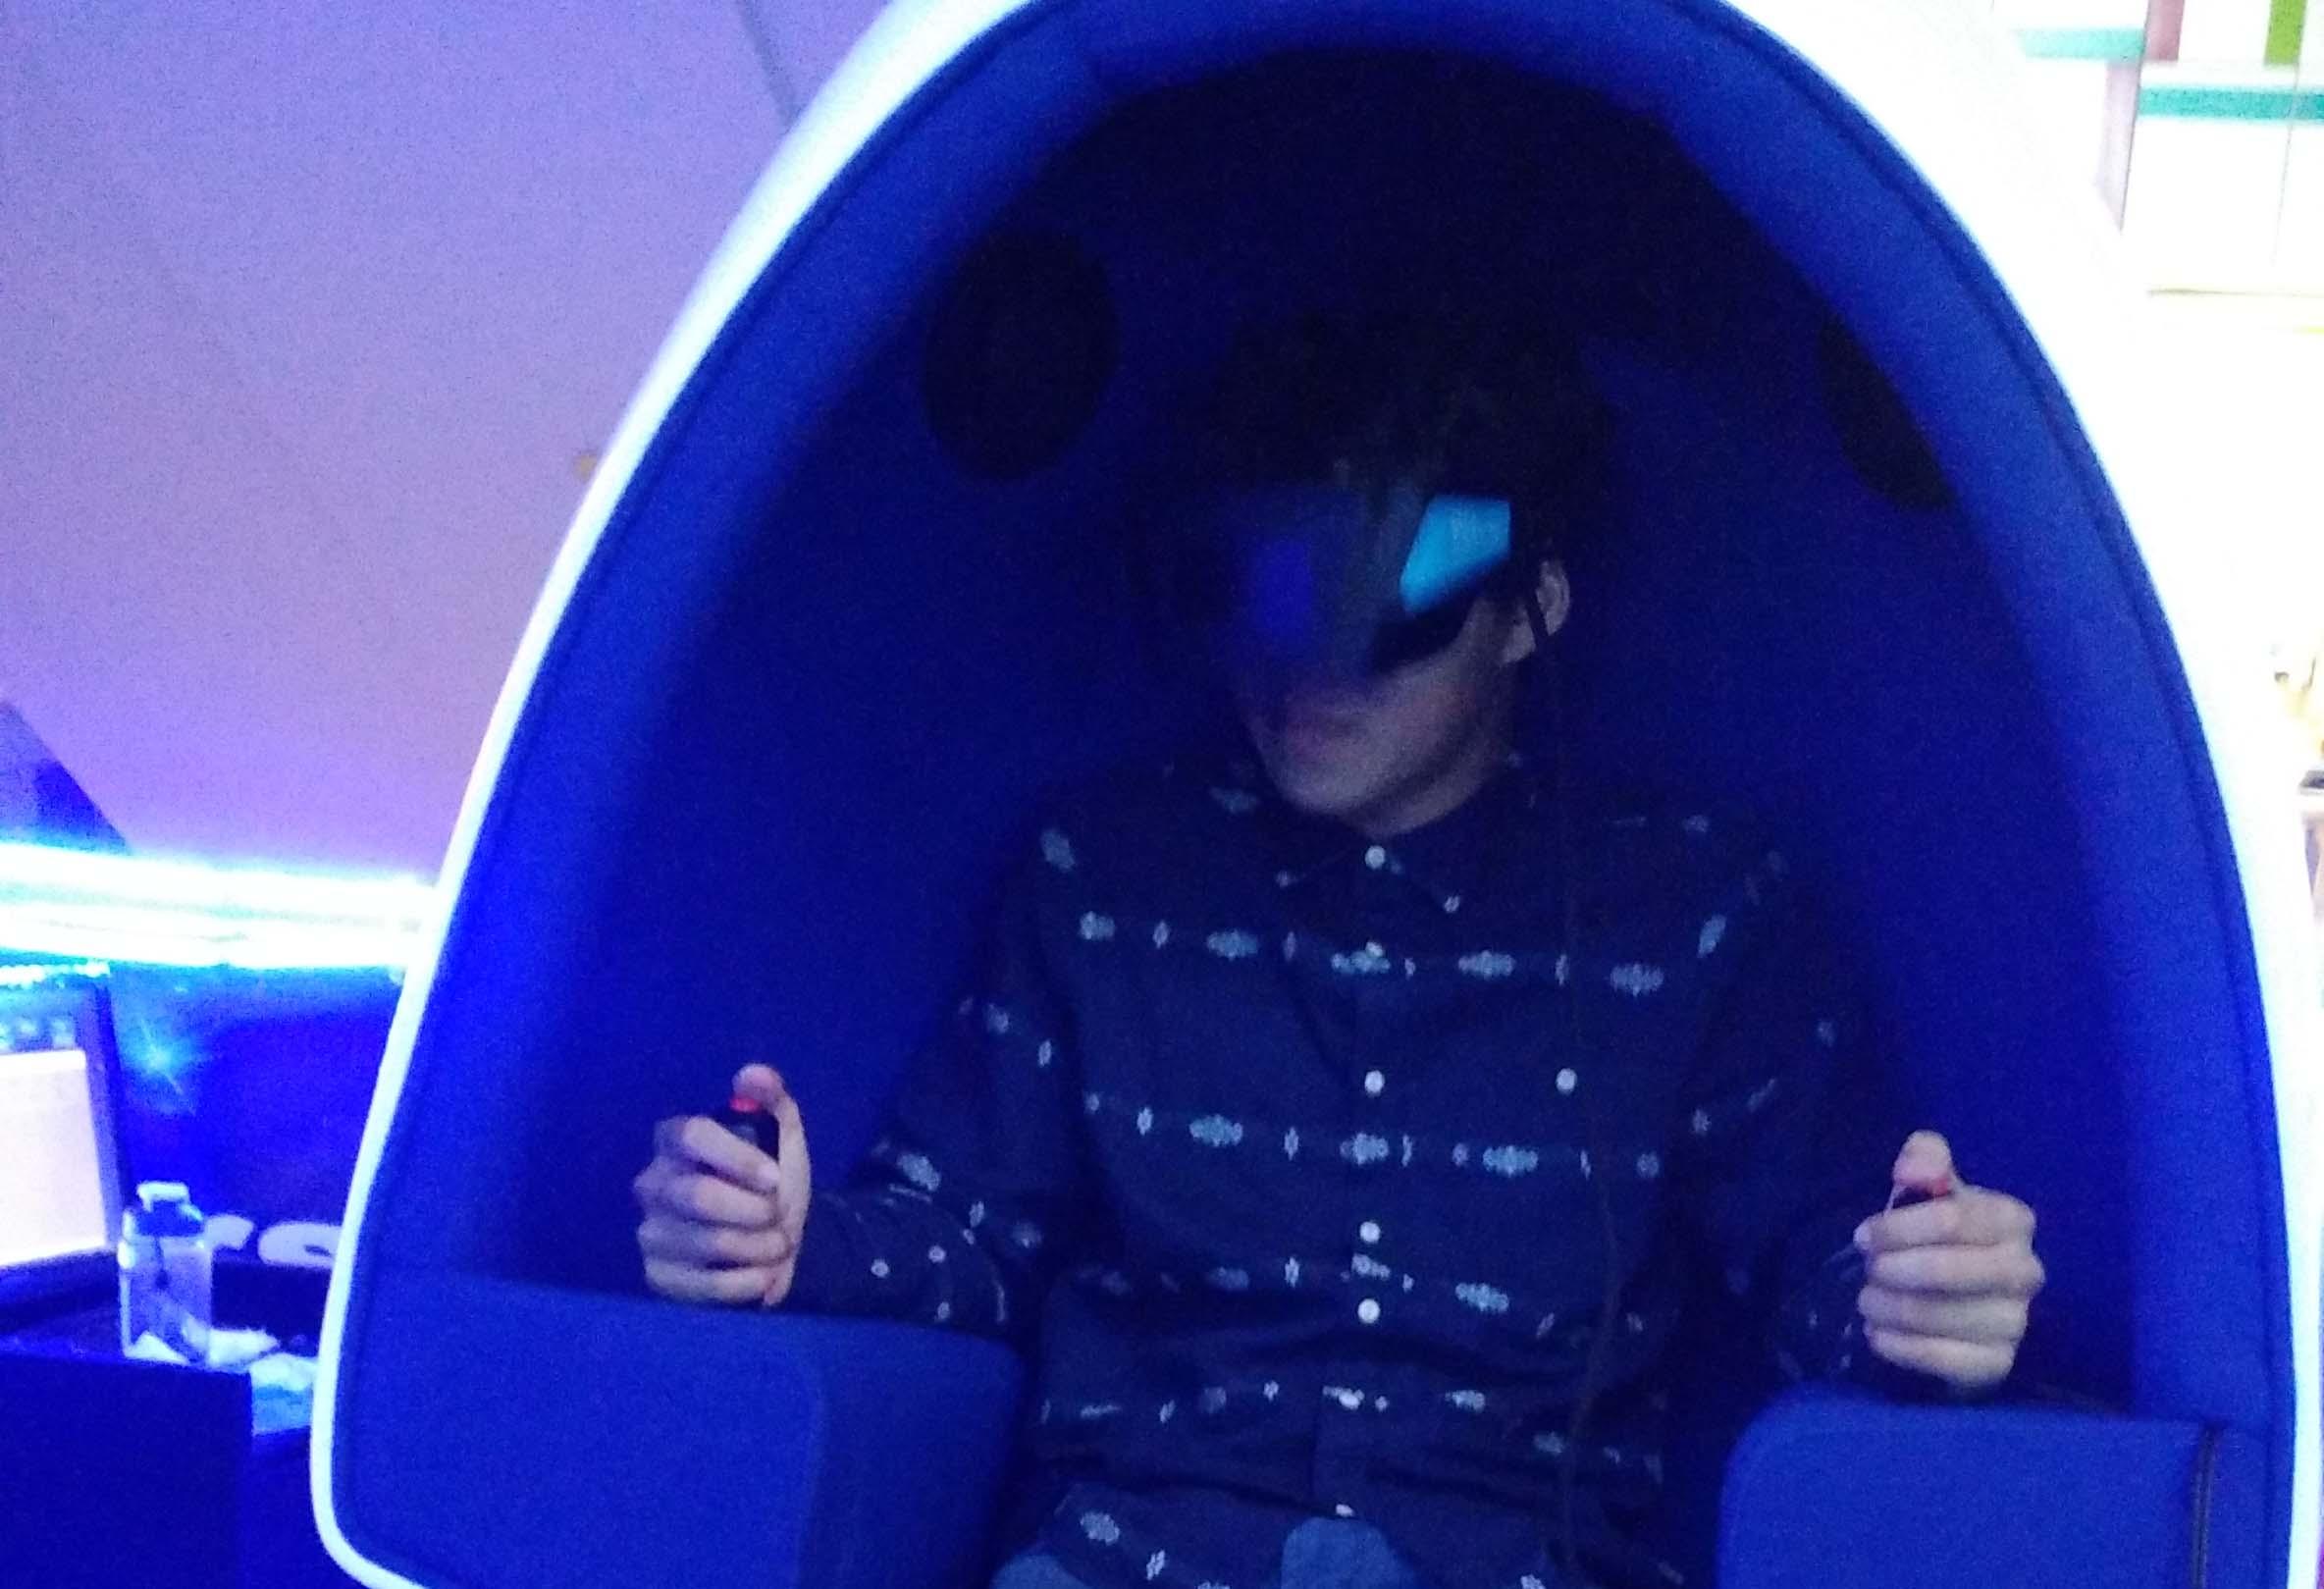 VR cinema 2